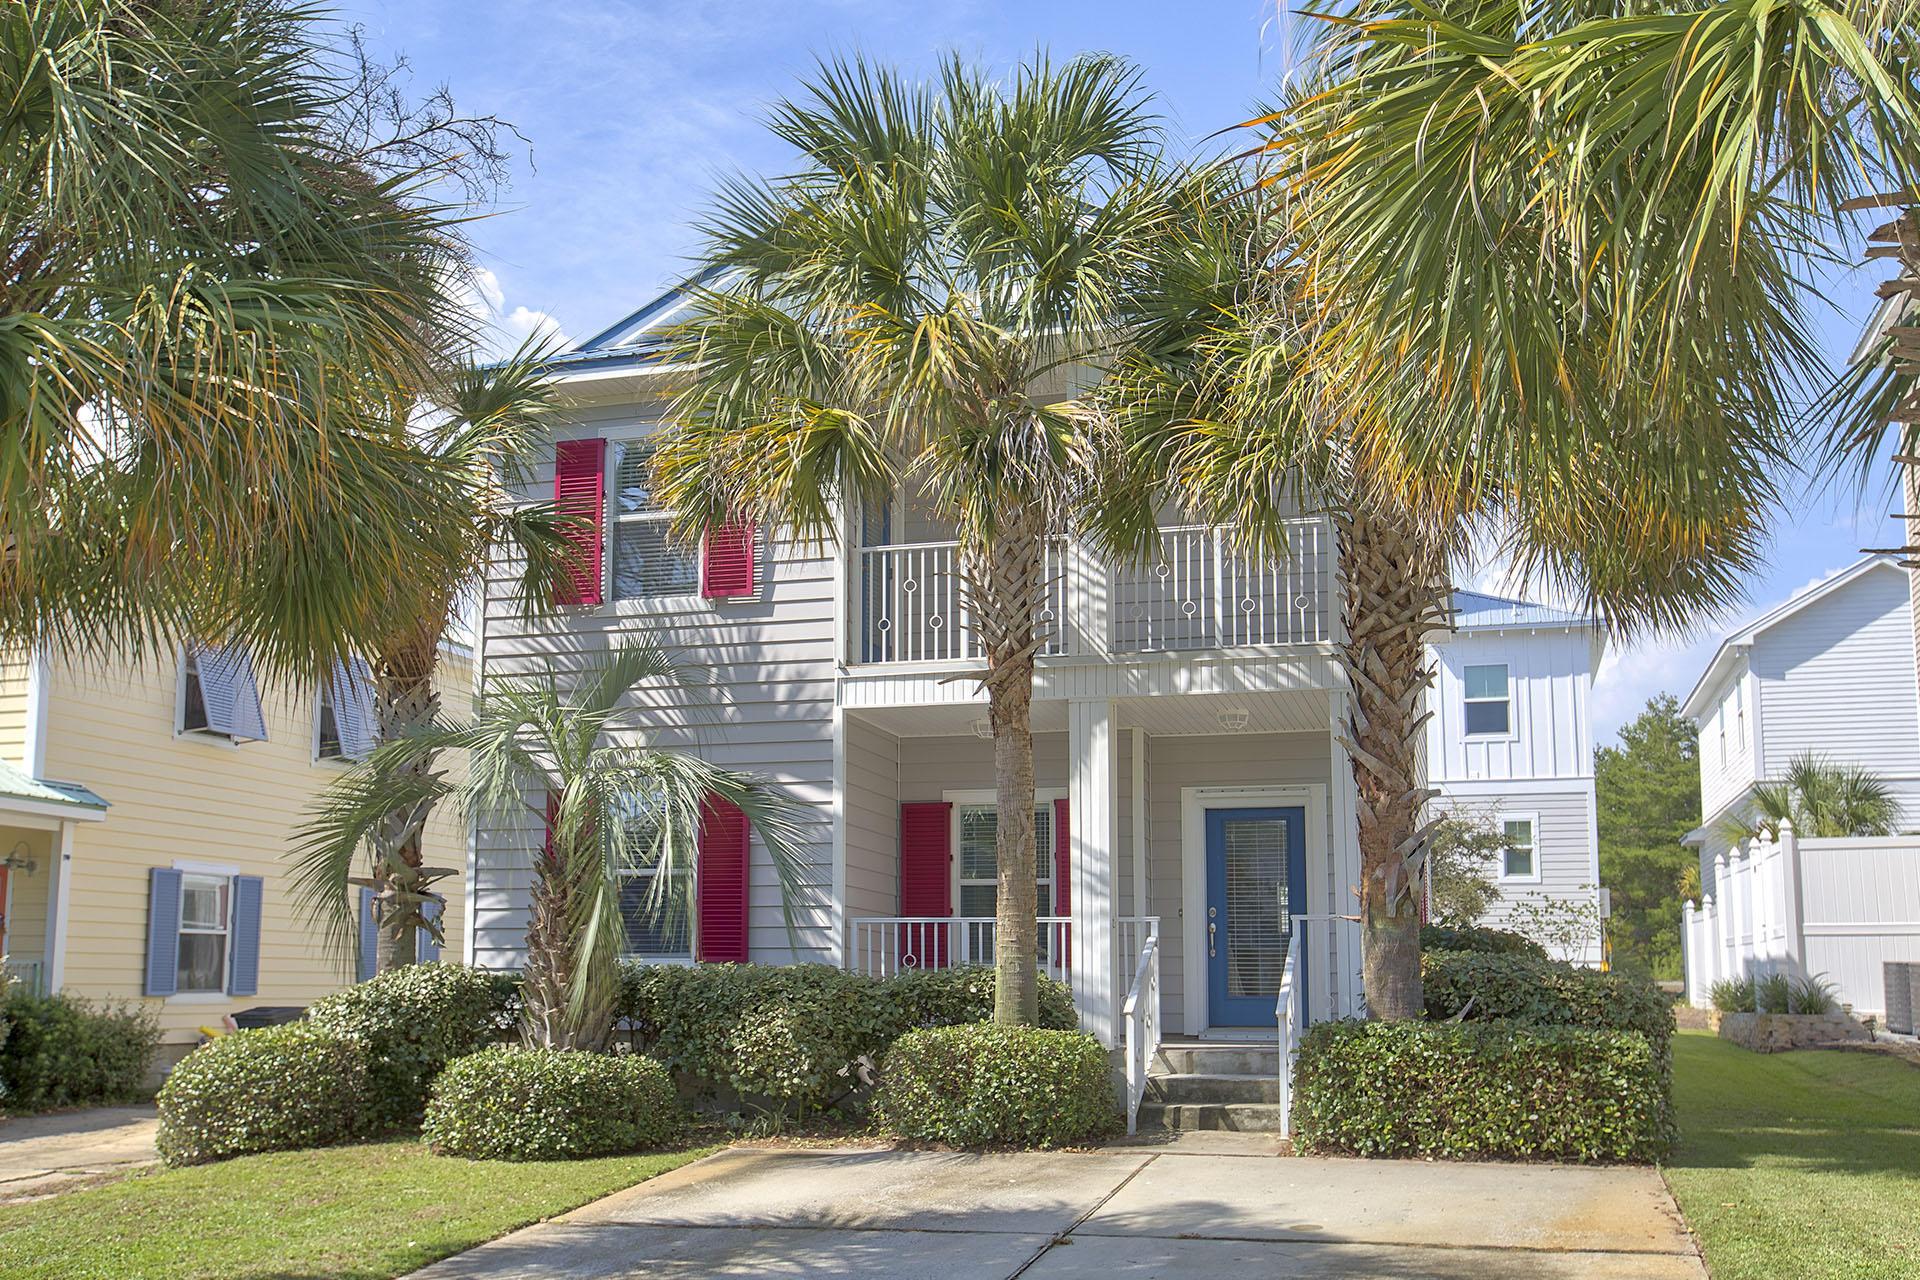 A 4 Bedroom 3 Bedroom Blue Gulf Resort Home